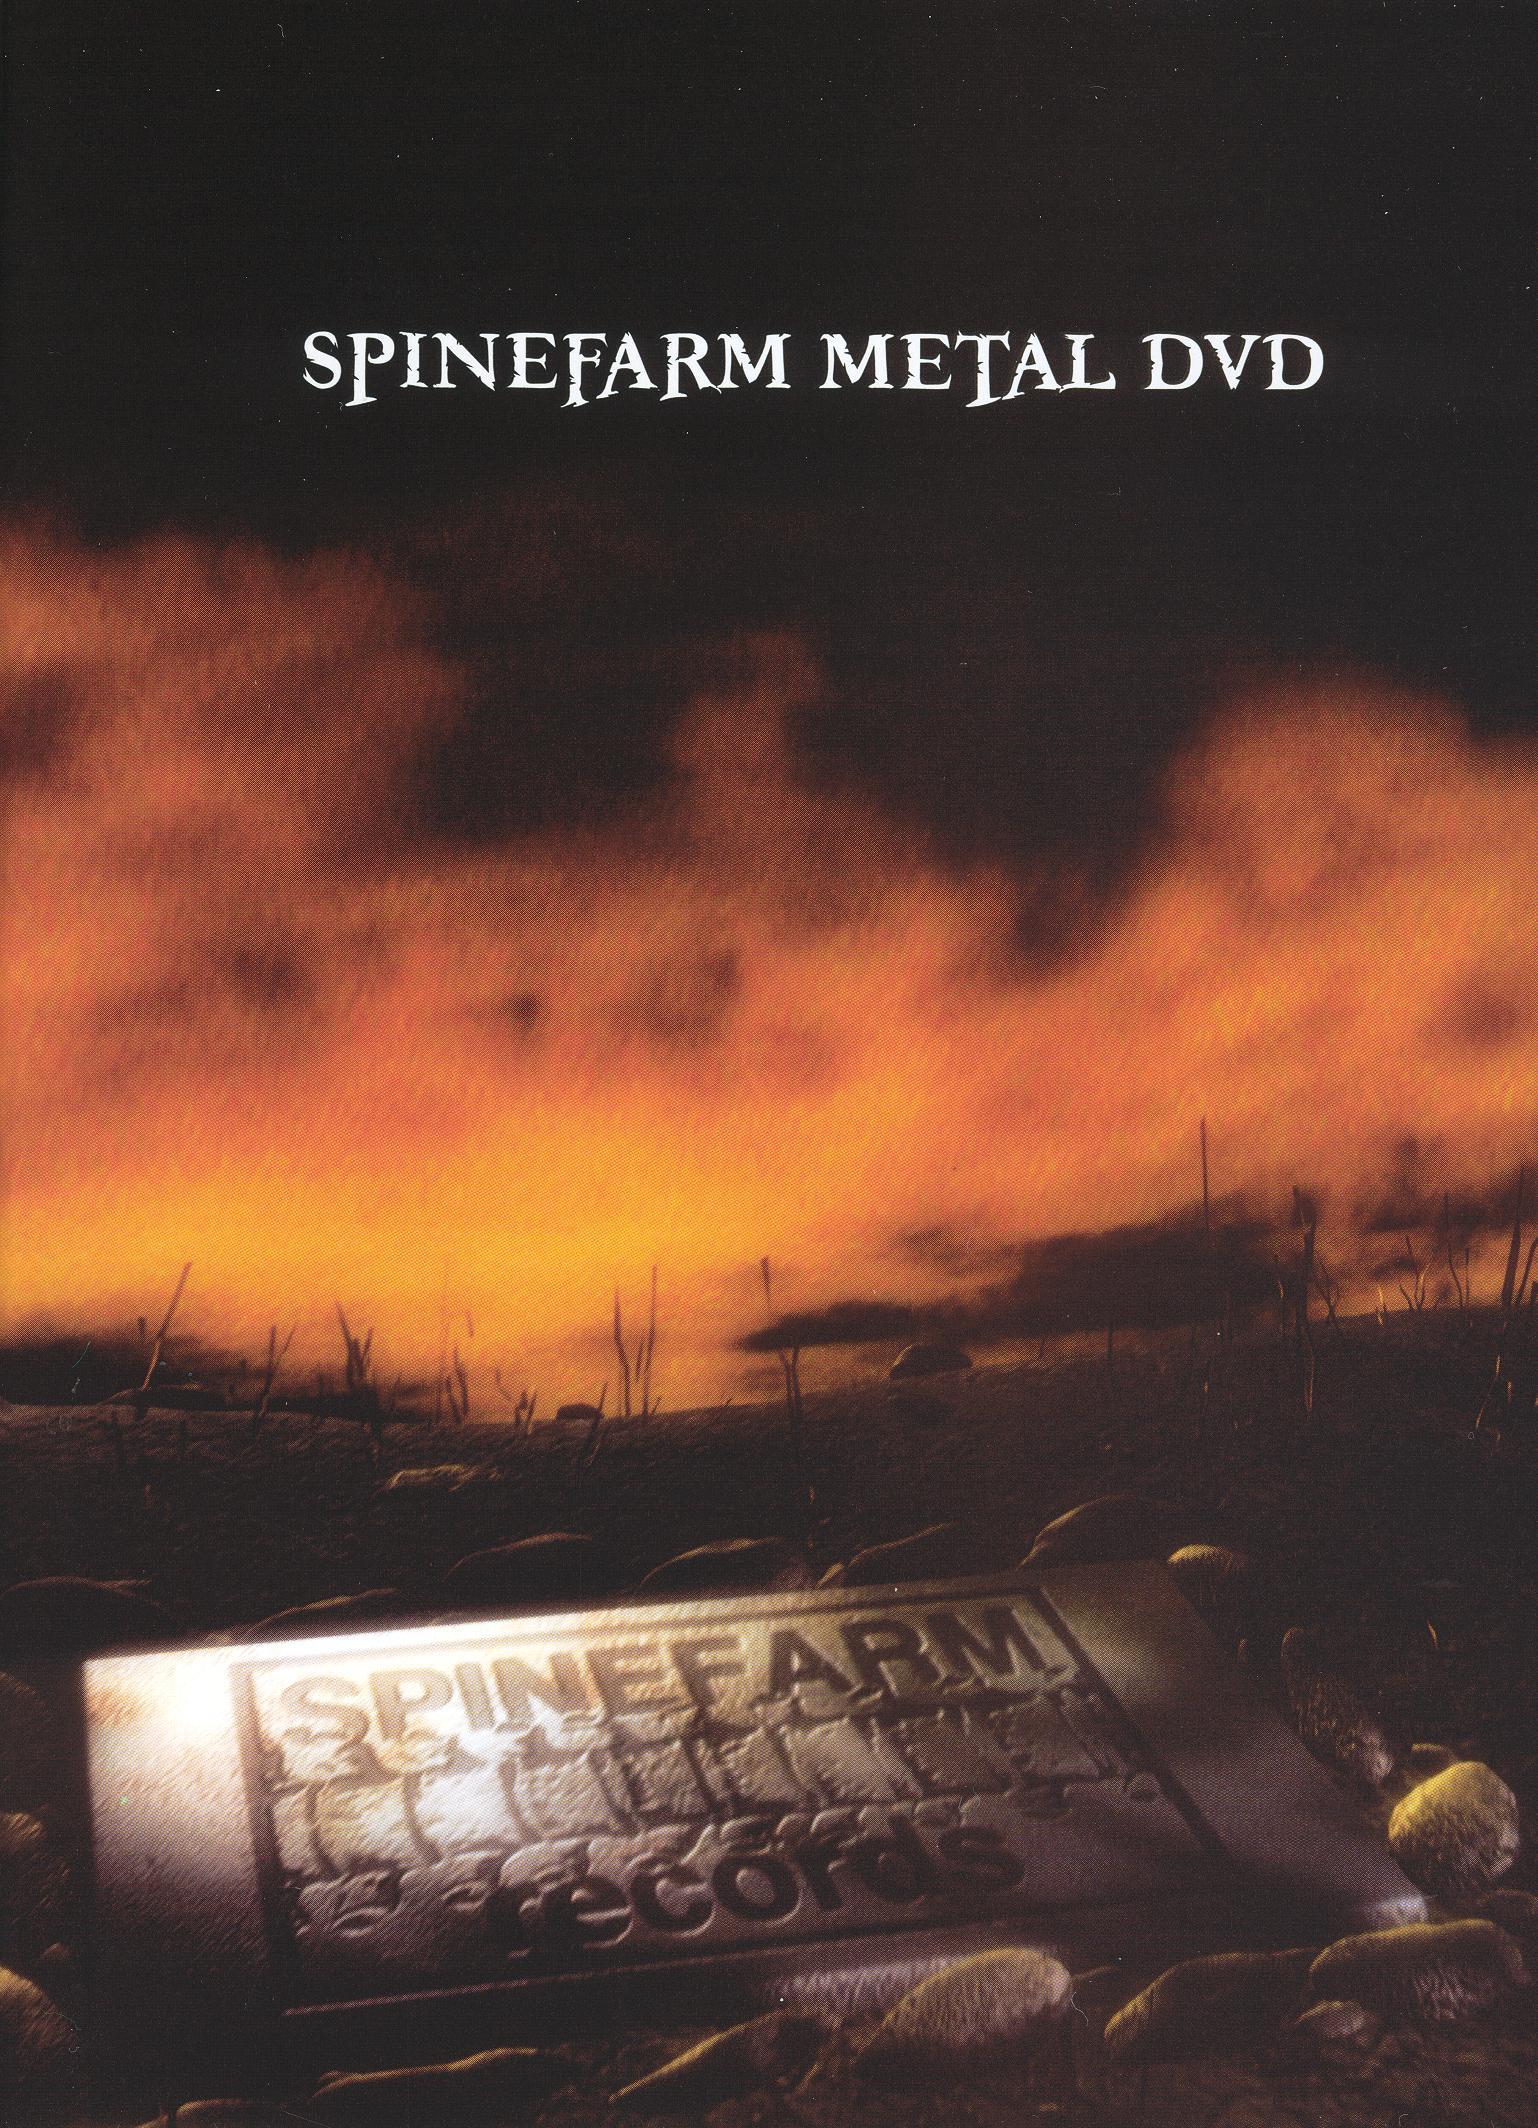 Spinefarm Metal DVD